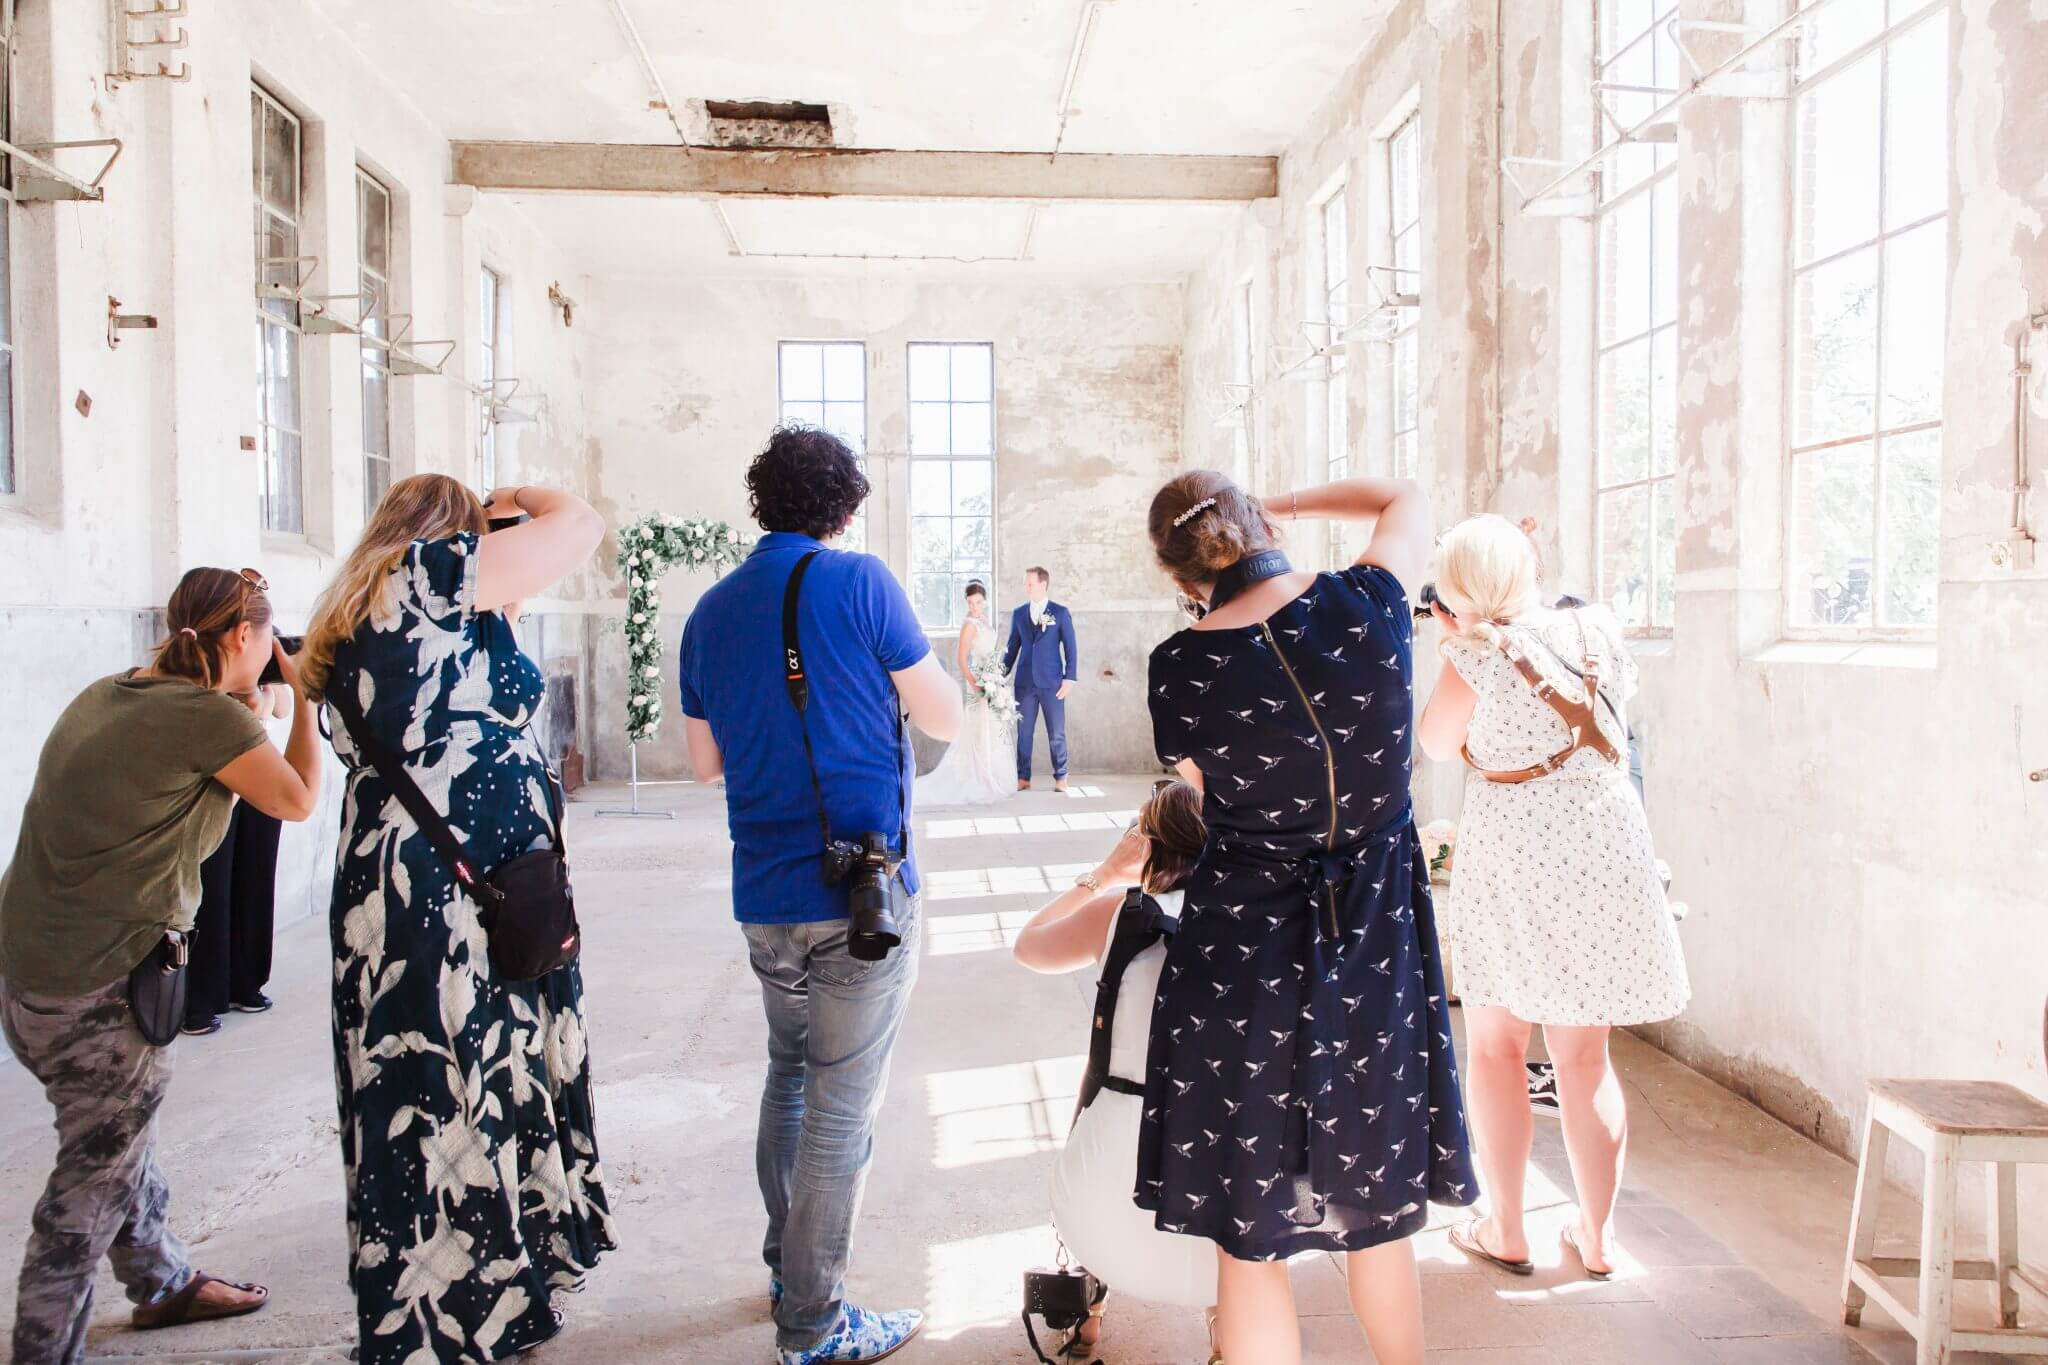 Styled wedding shoot, styled shoot, fabriek Zuidermeer, workshop, styling, bruidswerk, backdrop, bruidstaart, trouwen, Lijn 10